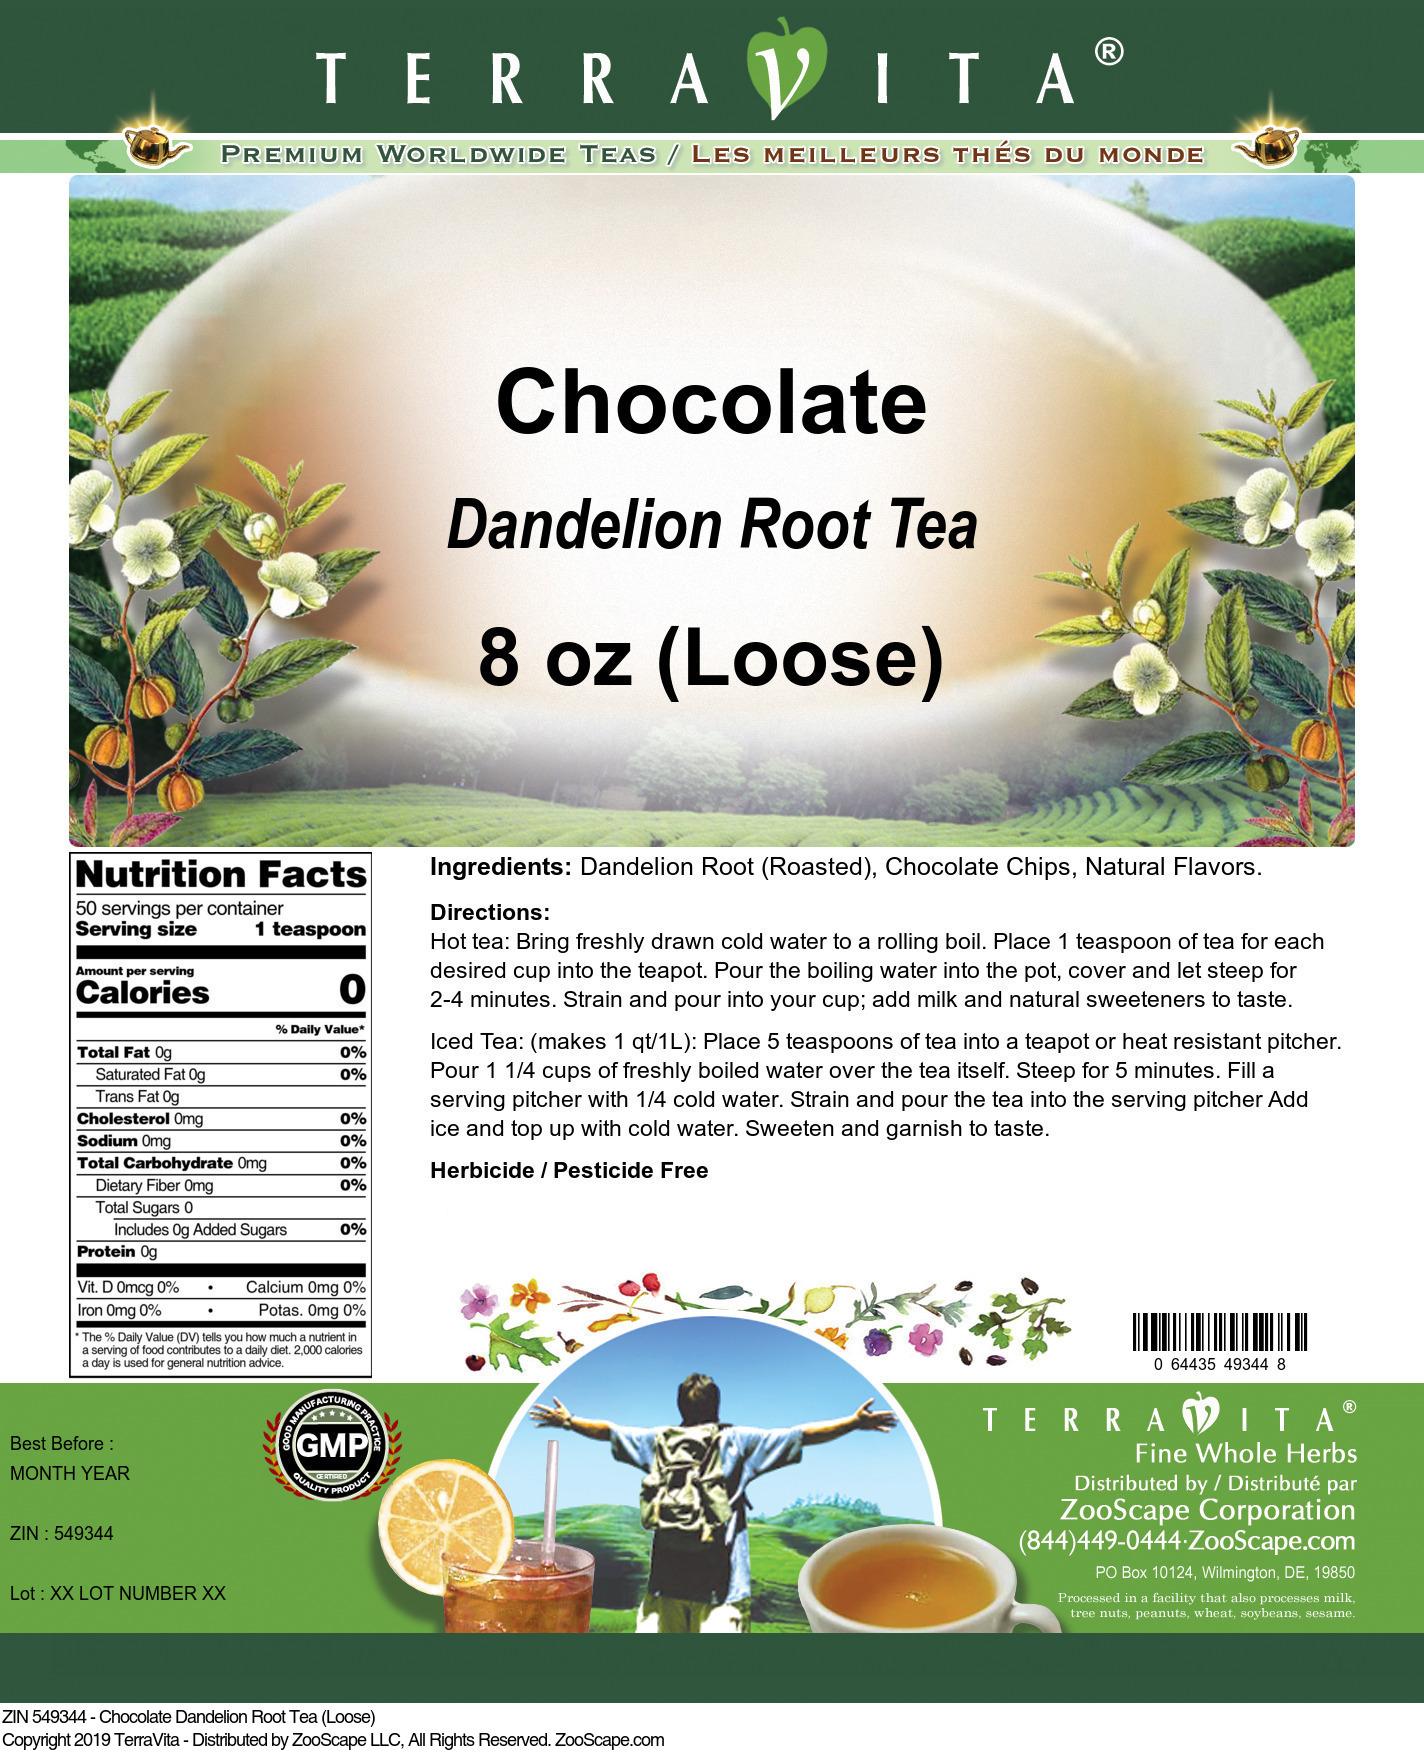 Chocolate Dandelion Root